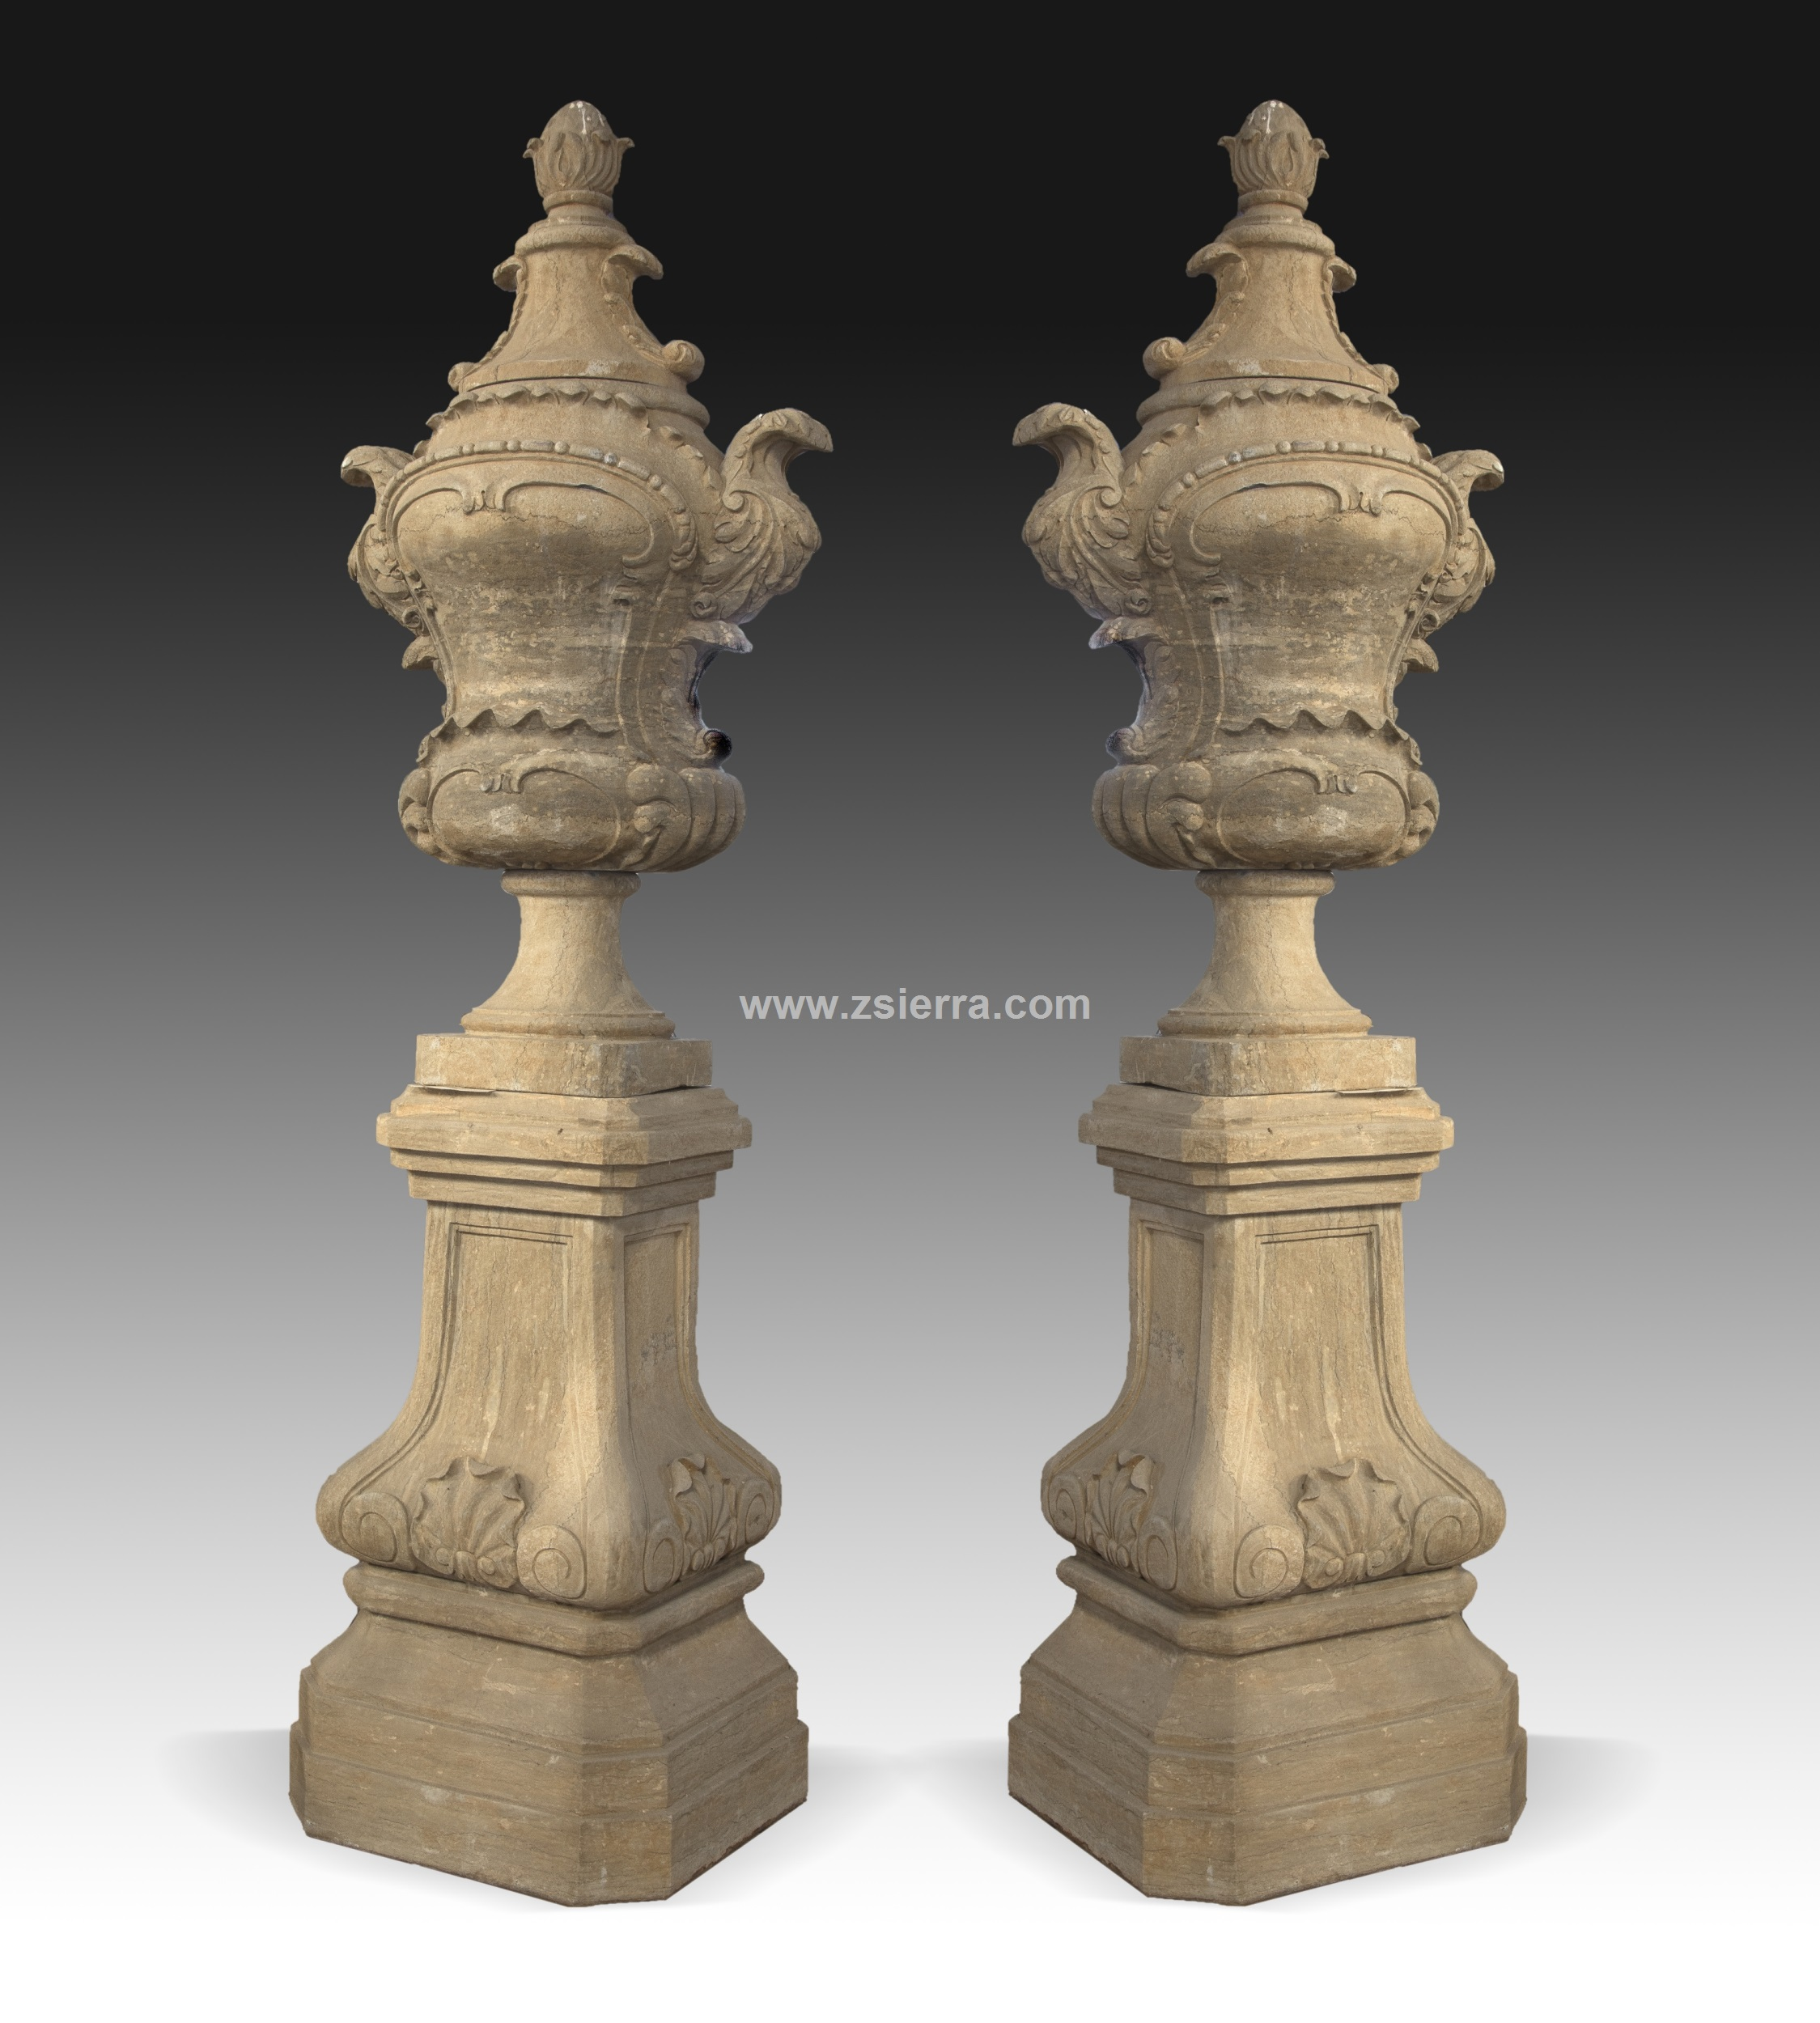 home sculpture pedestal for artist on a cronin by susan read sculptures rubbermaid bronze